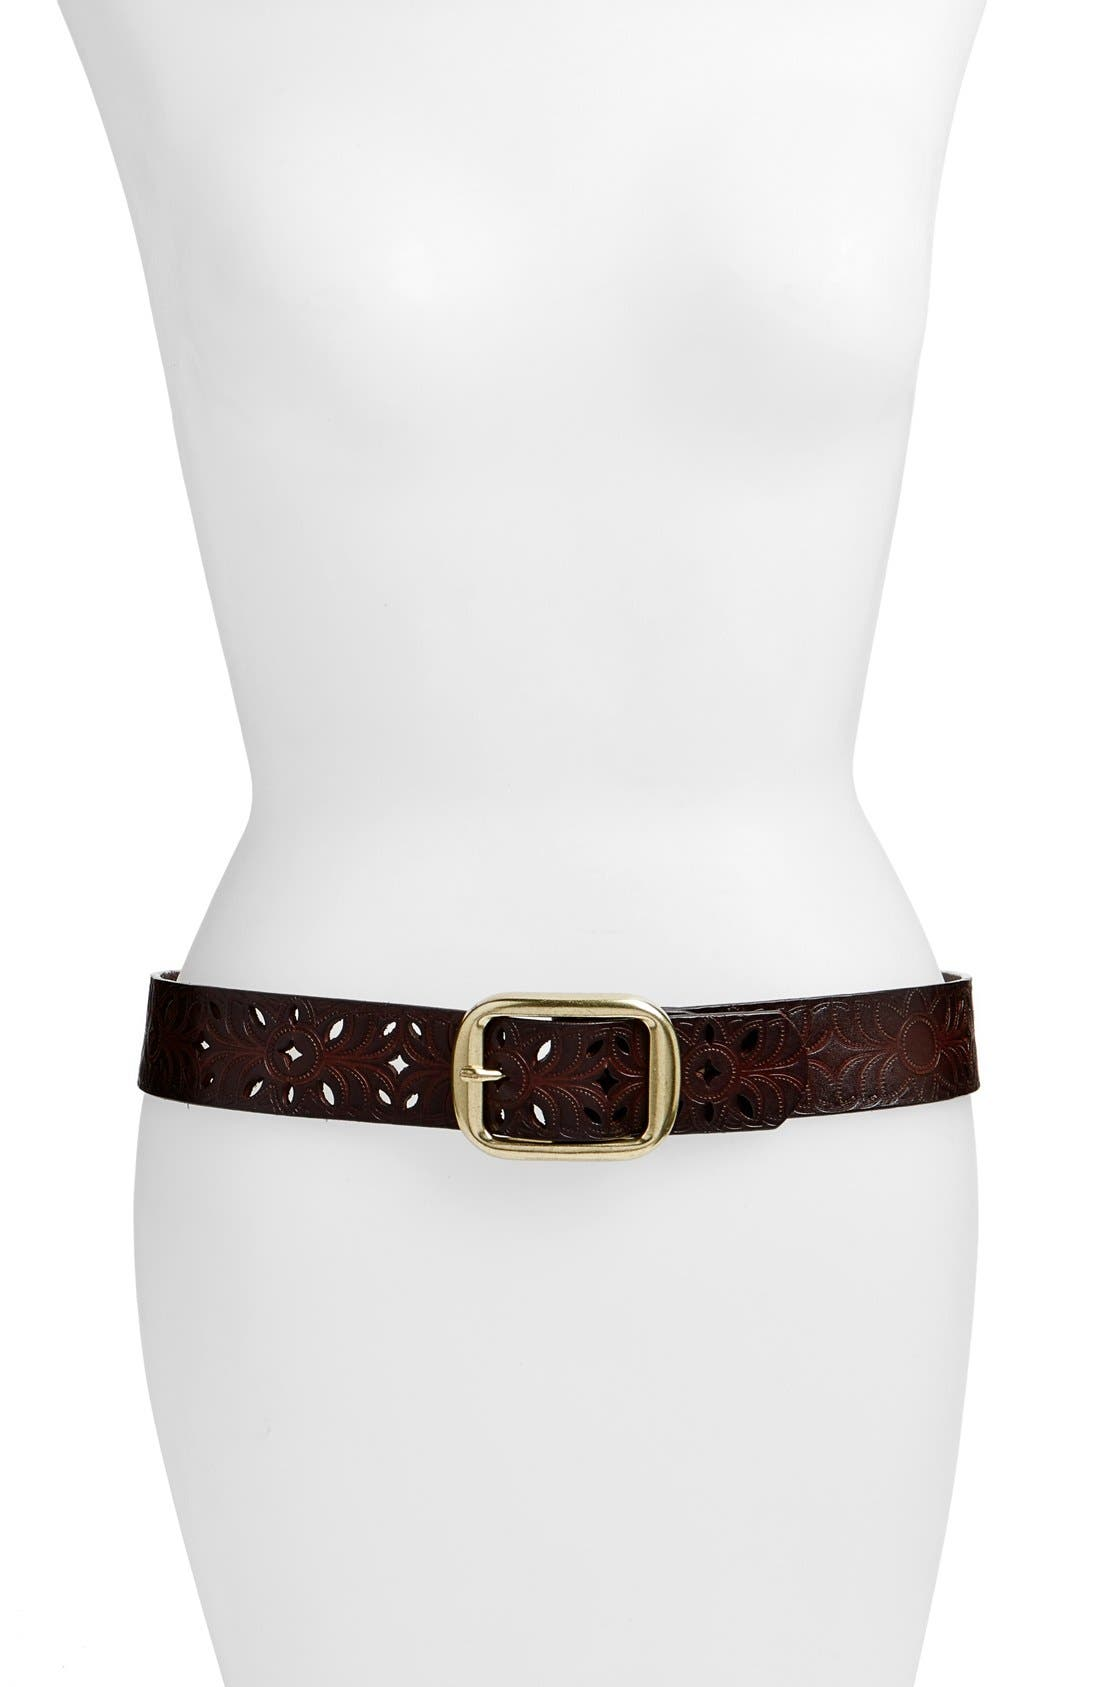 ELISE M. 'Cantina' Leather Hip Belt in Capp